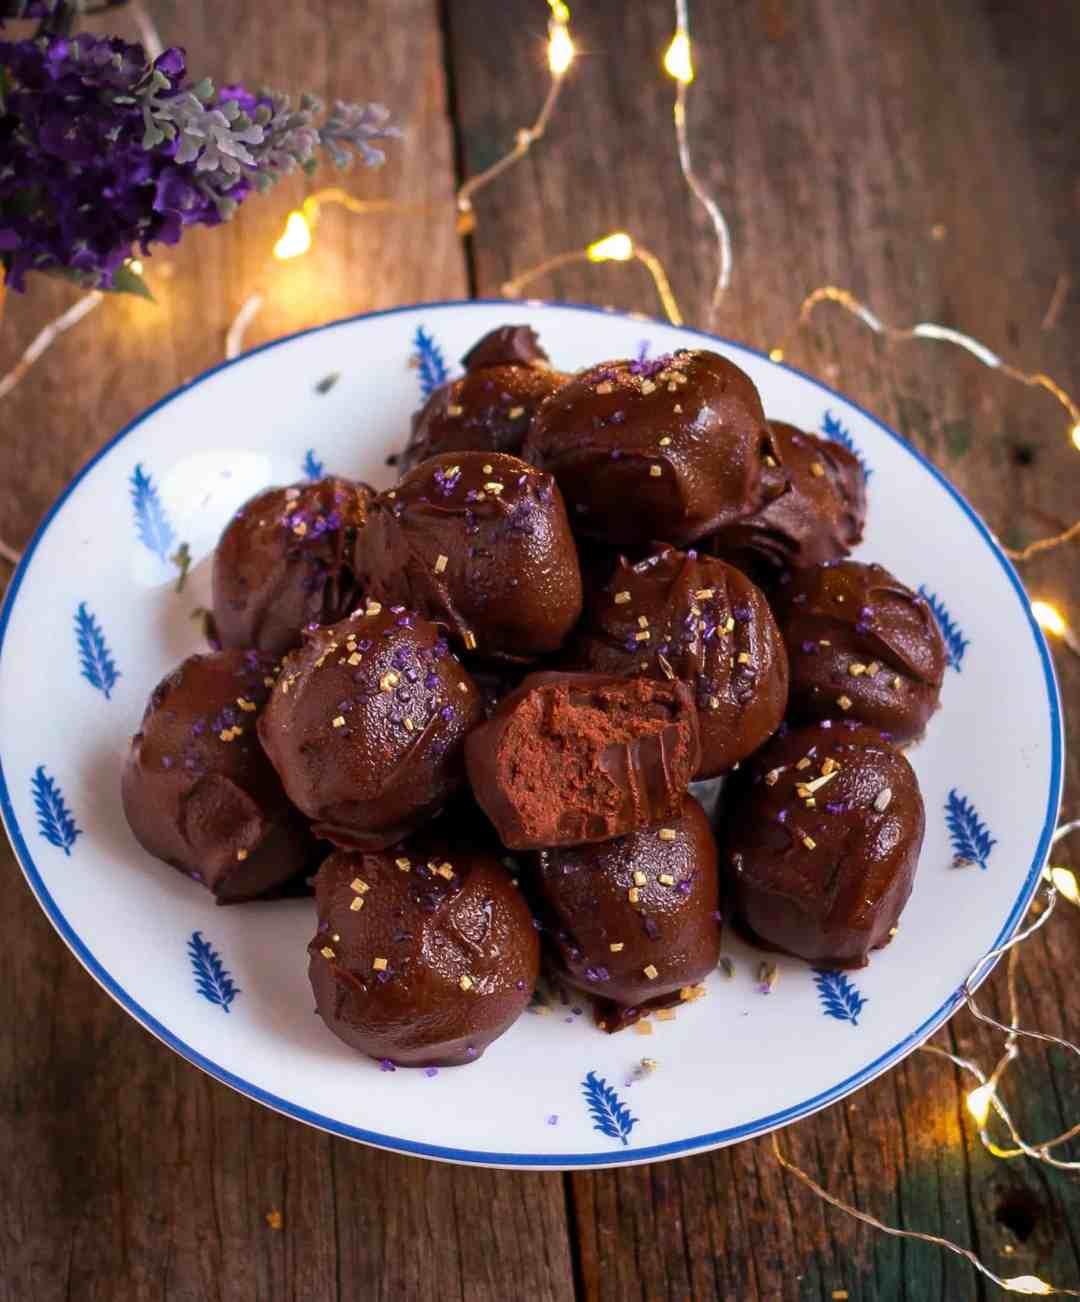 Lavender Chocolate Truffles vegan glutenfree dairyfree no bake recipe